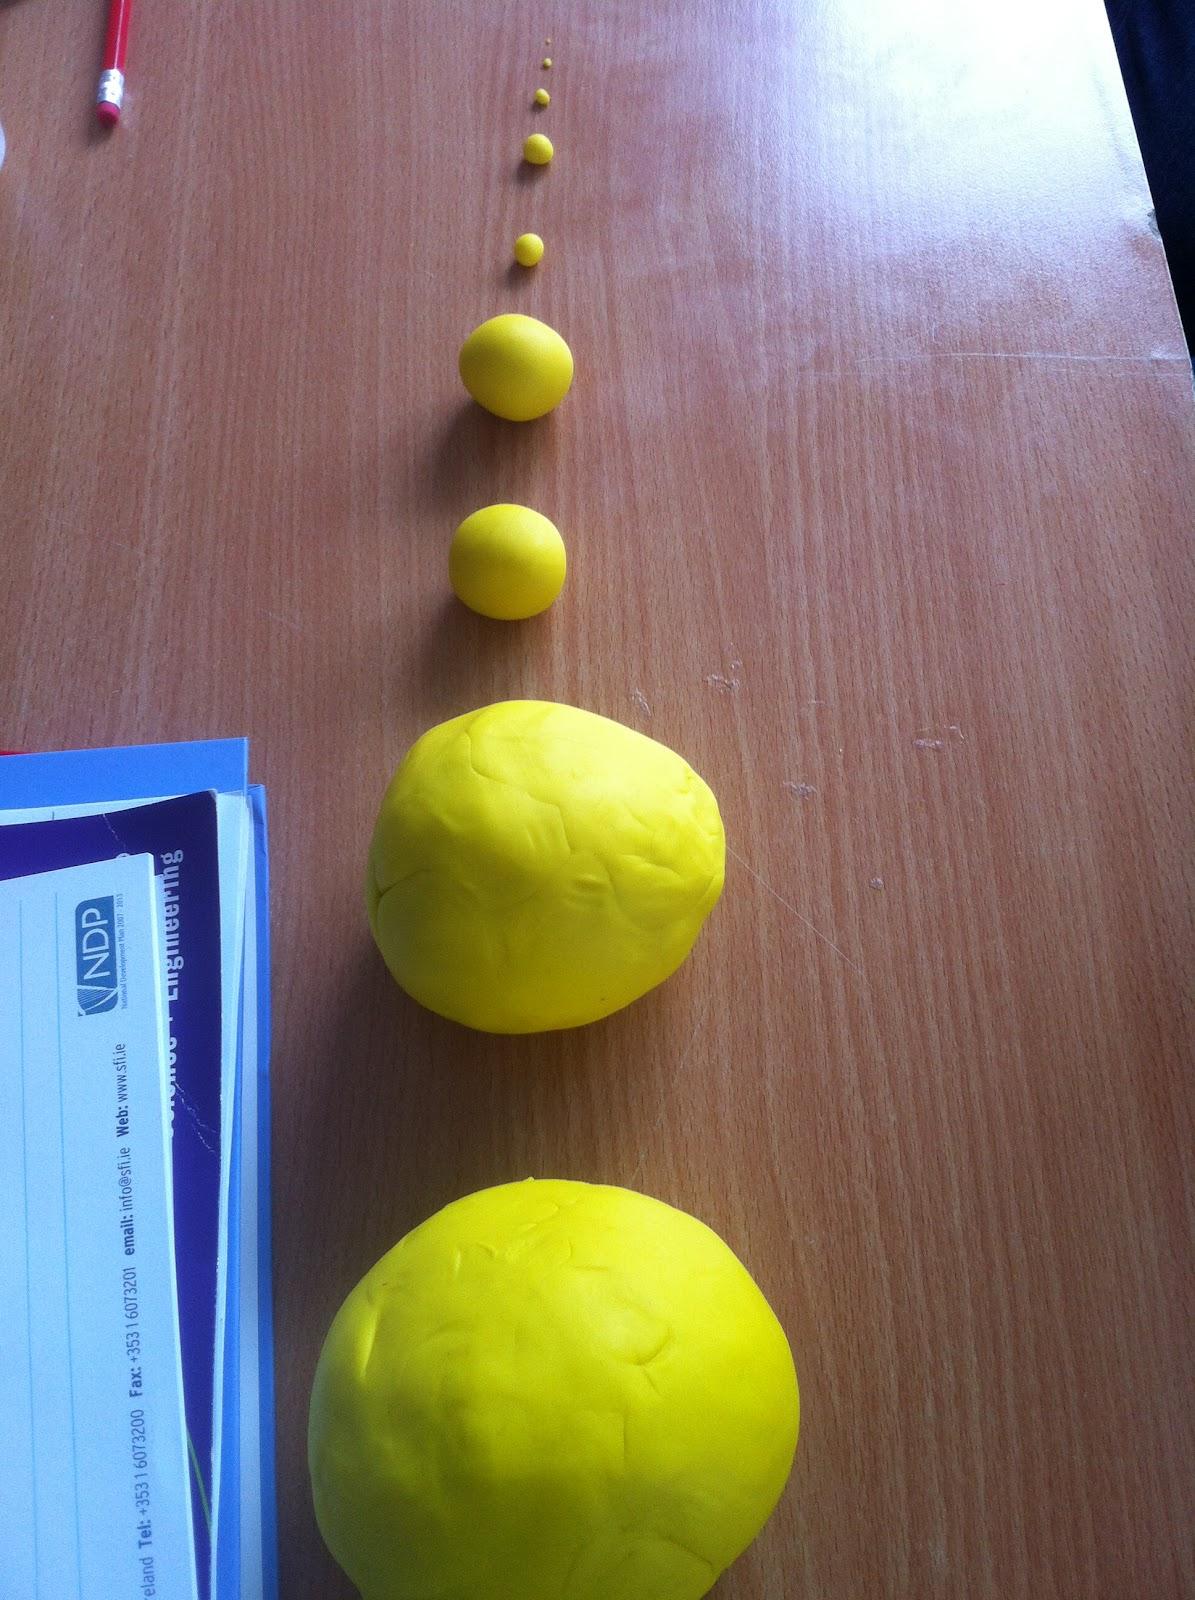 3d solar system model ideas - photo #29